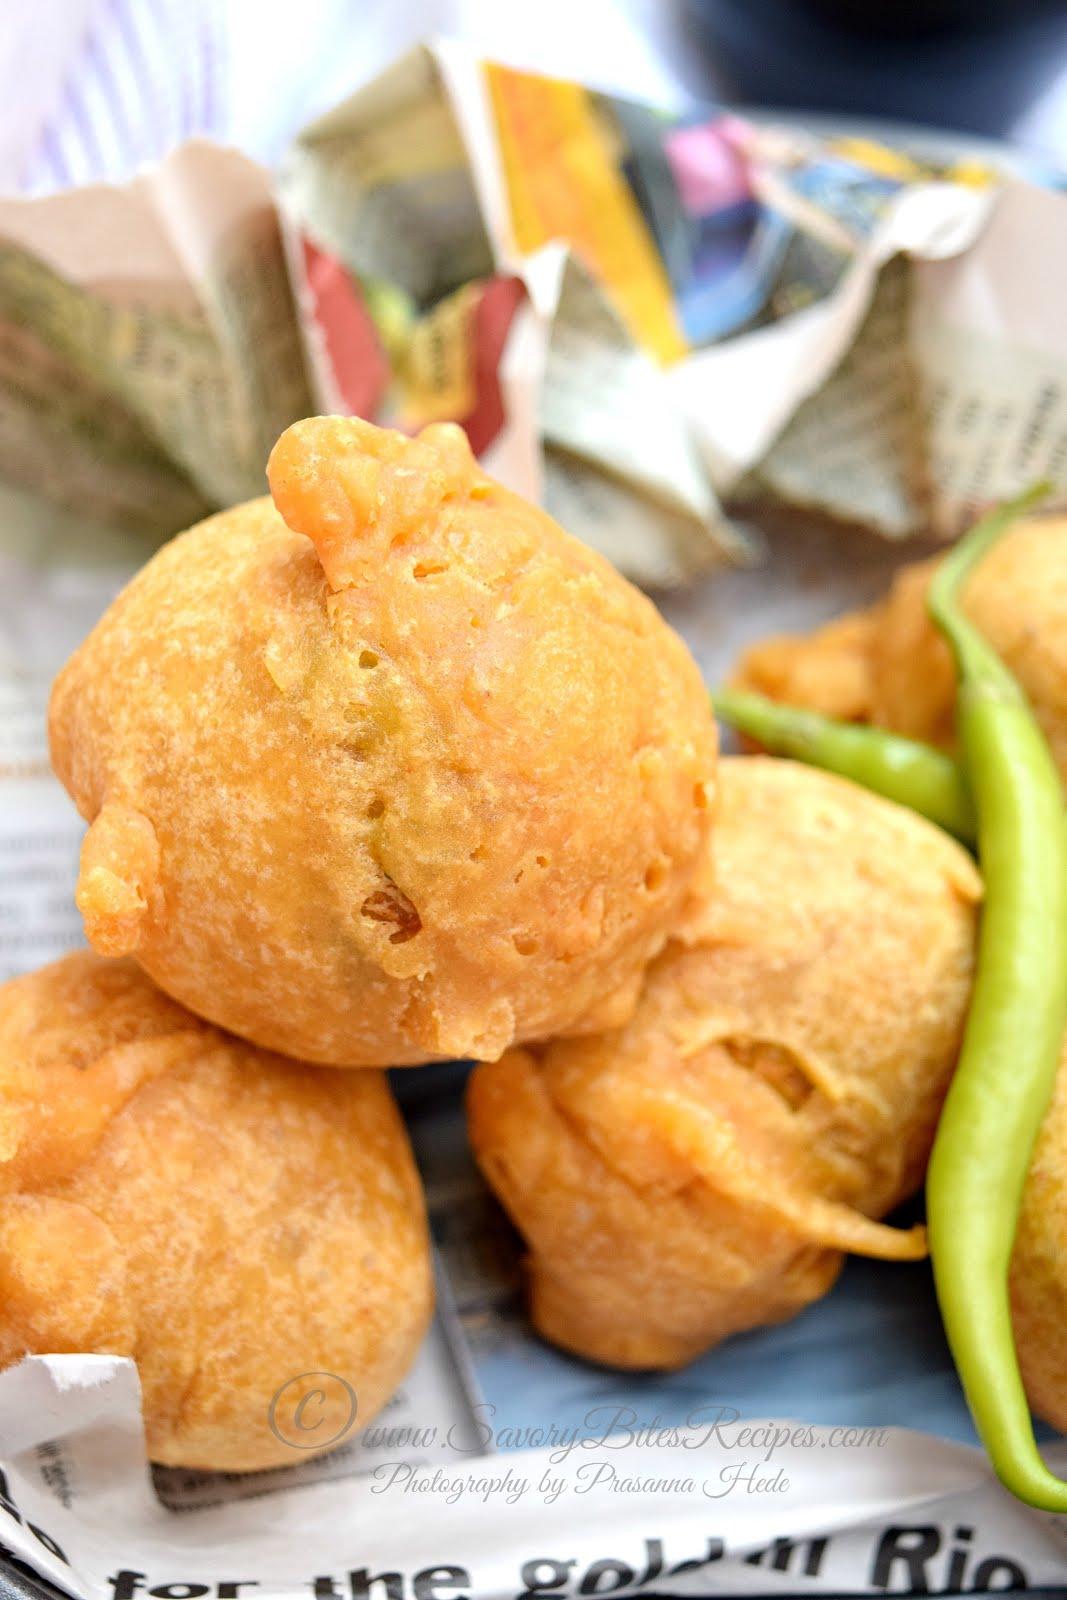 Batata Vada Wada Vada Pav Street Food Indian Vegetarian Tea-time snack Potato Vada